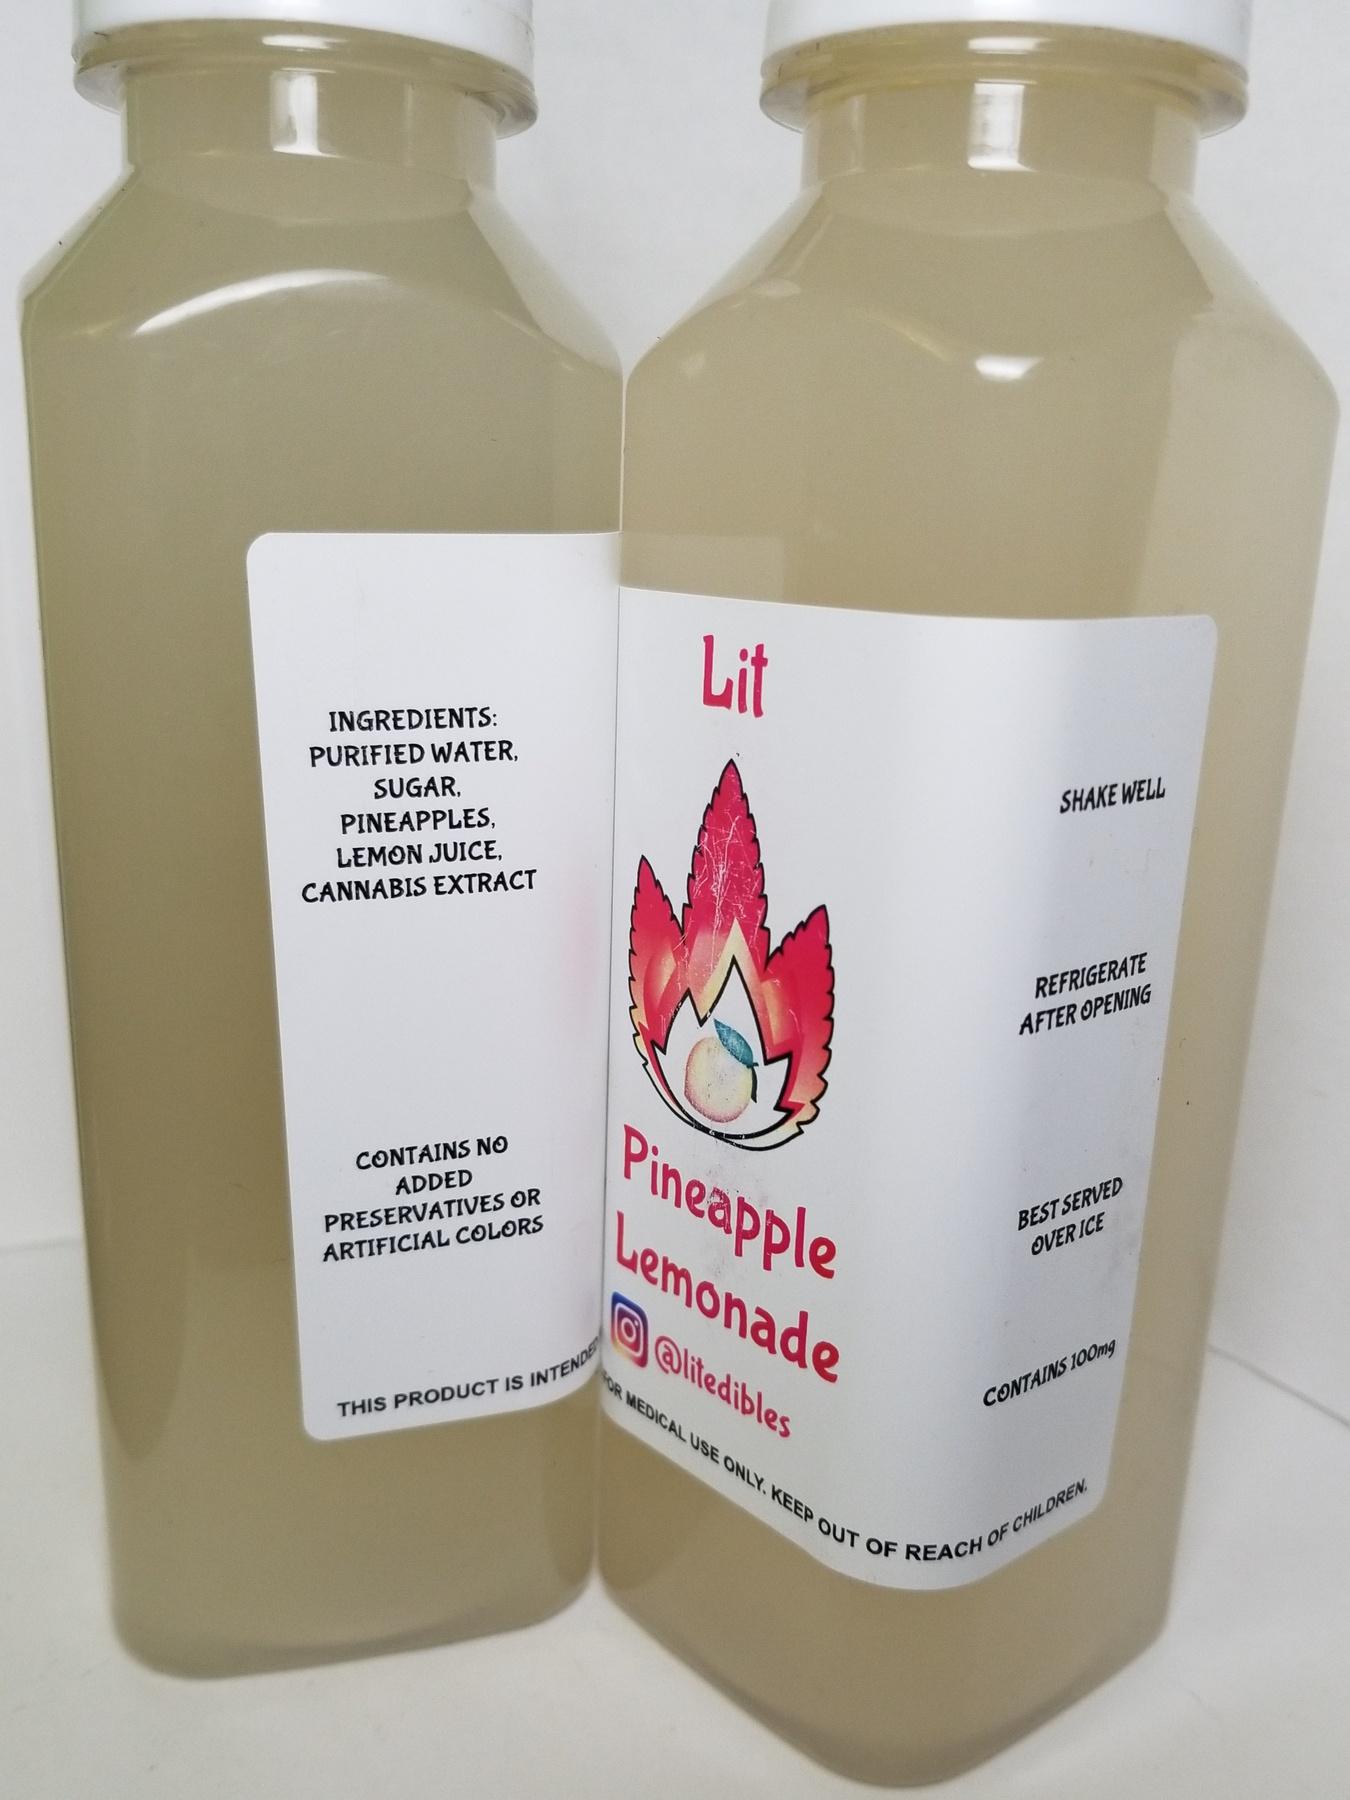 100mg LIT Lemonade- Pineapple  Product image